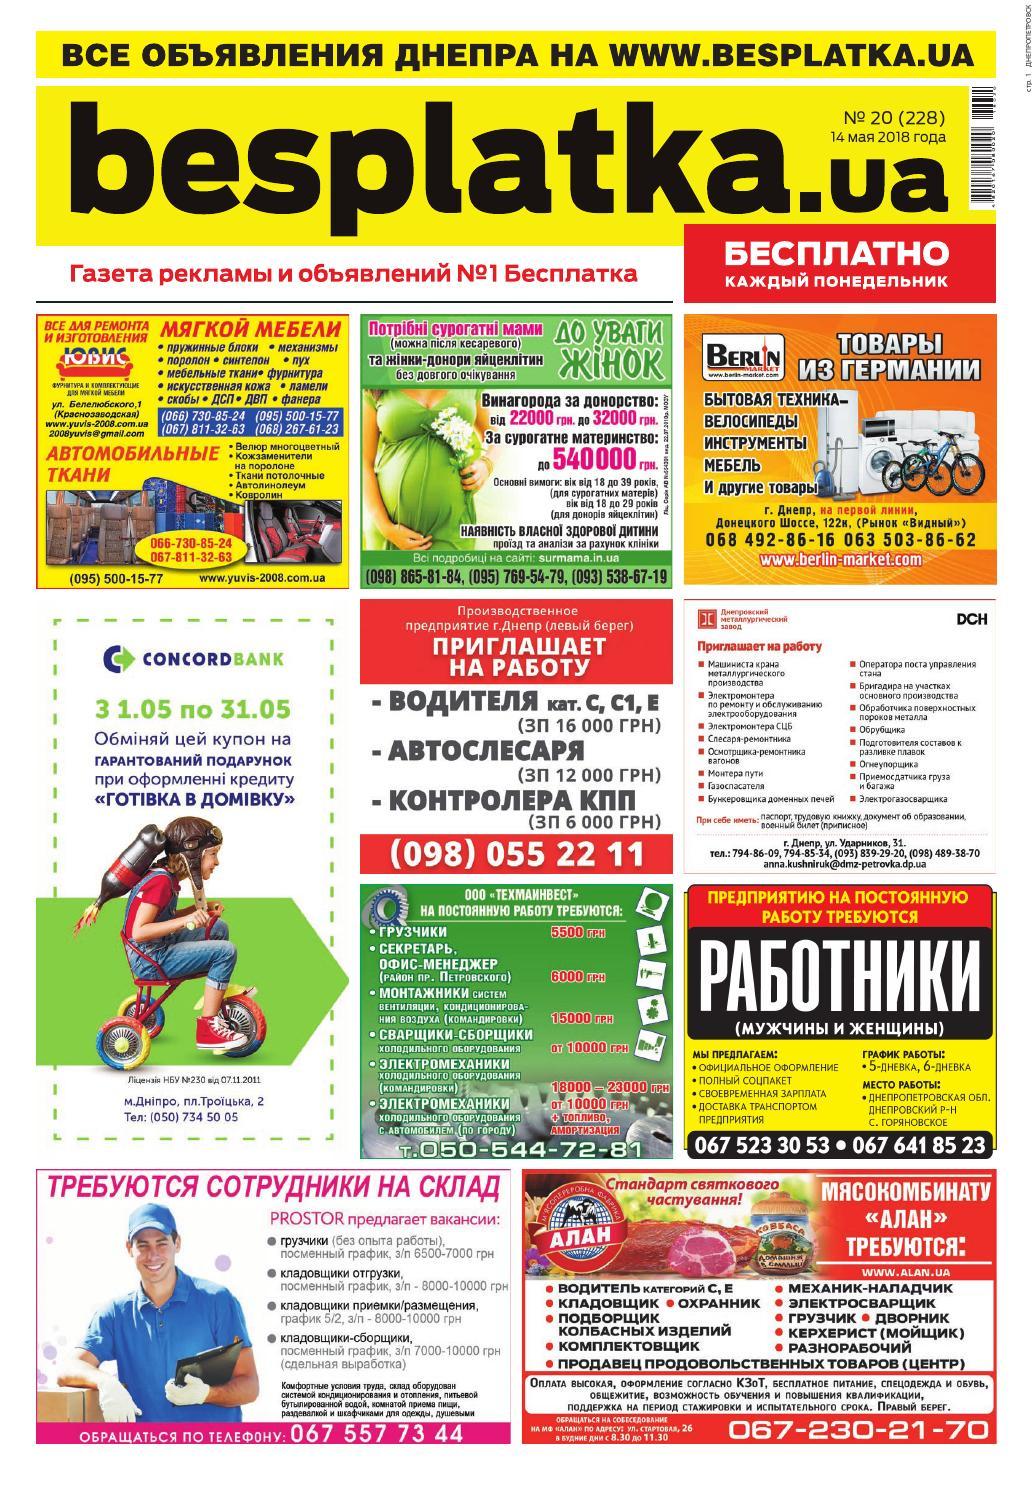 a382a6cd715 Besplatka  20 Днепр by besplatka ukraine - issuu